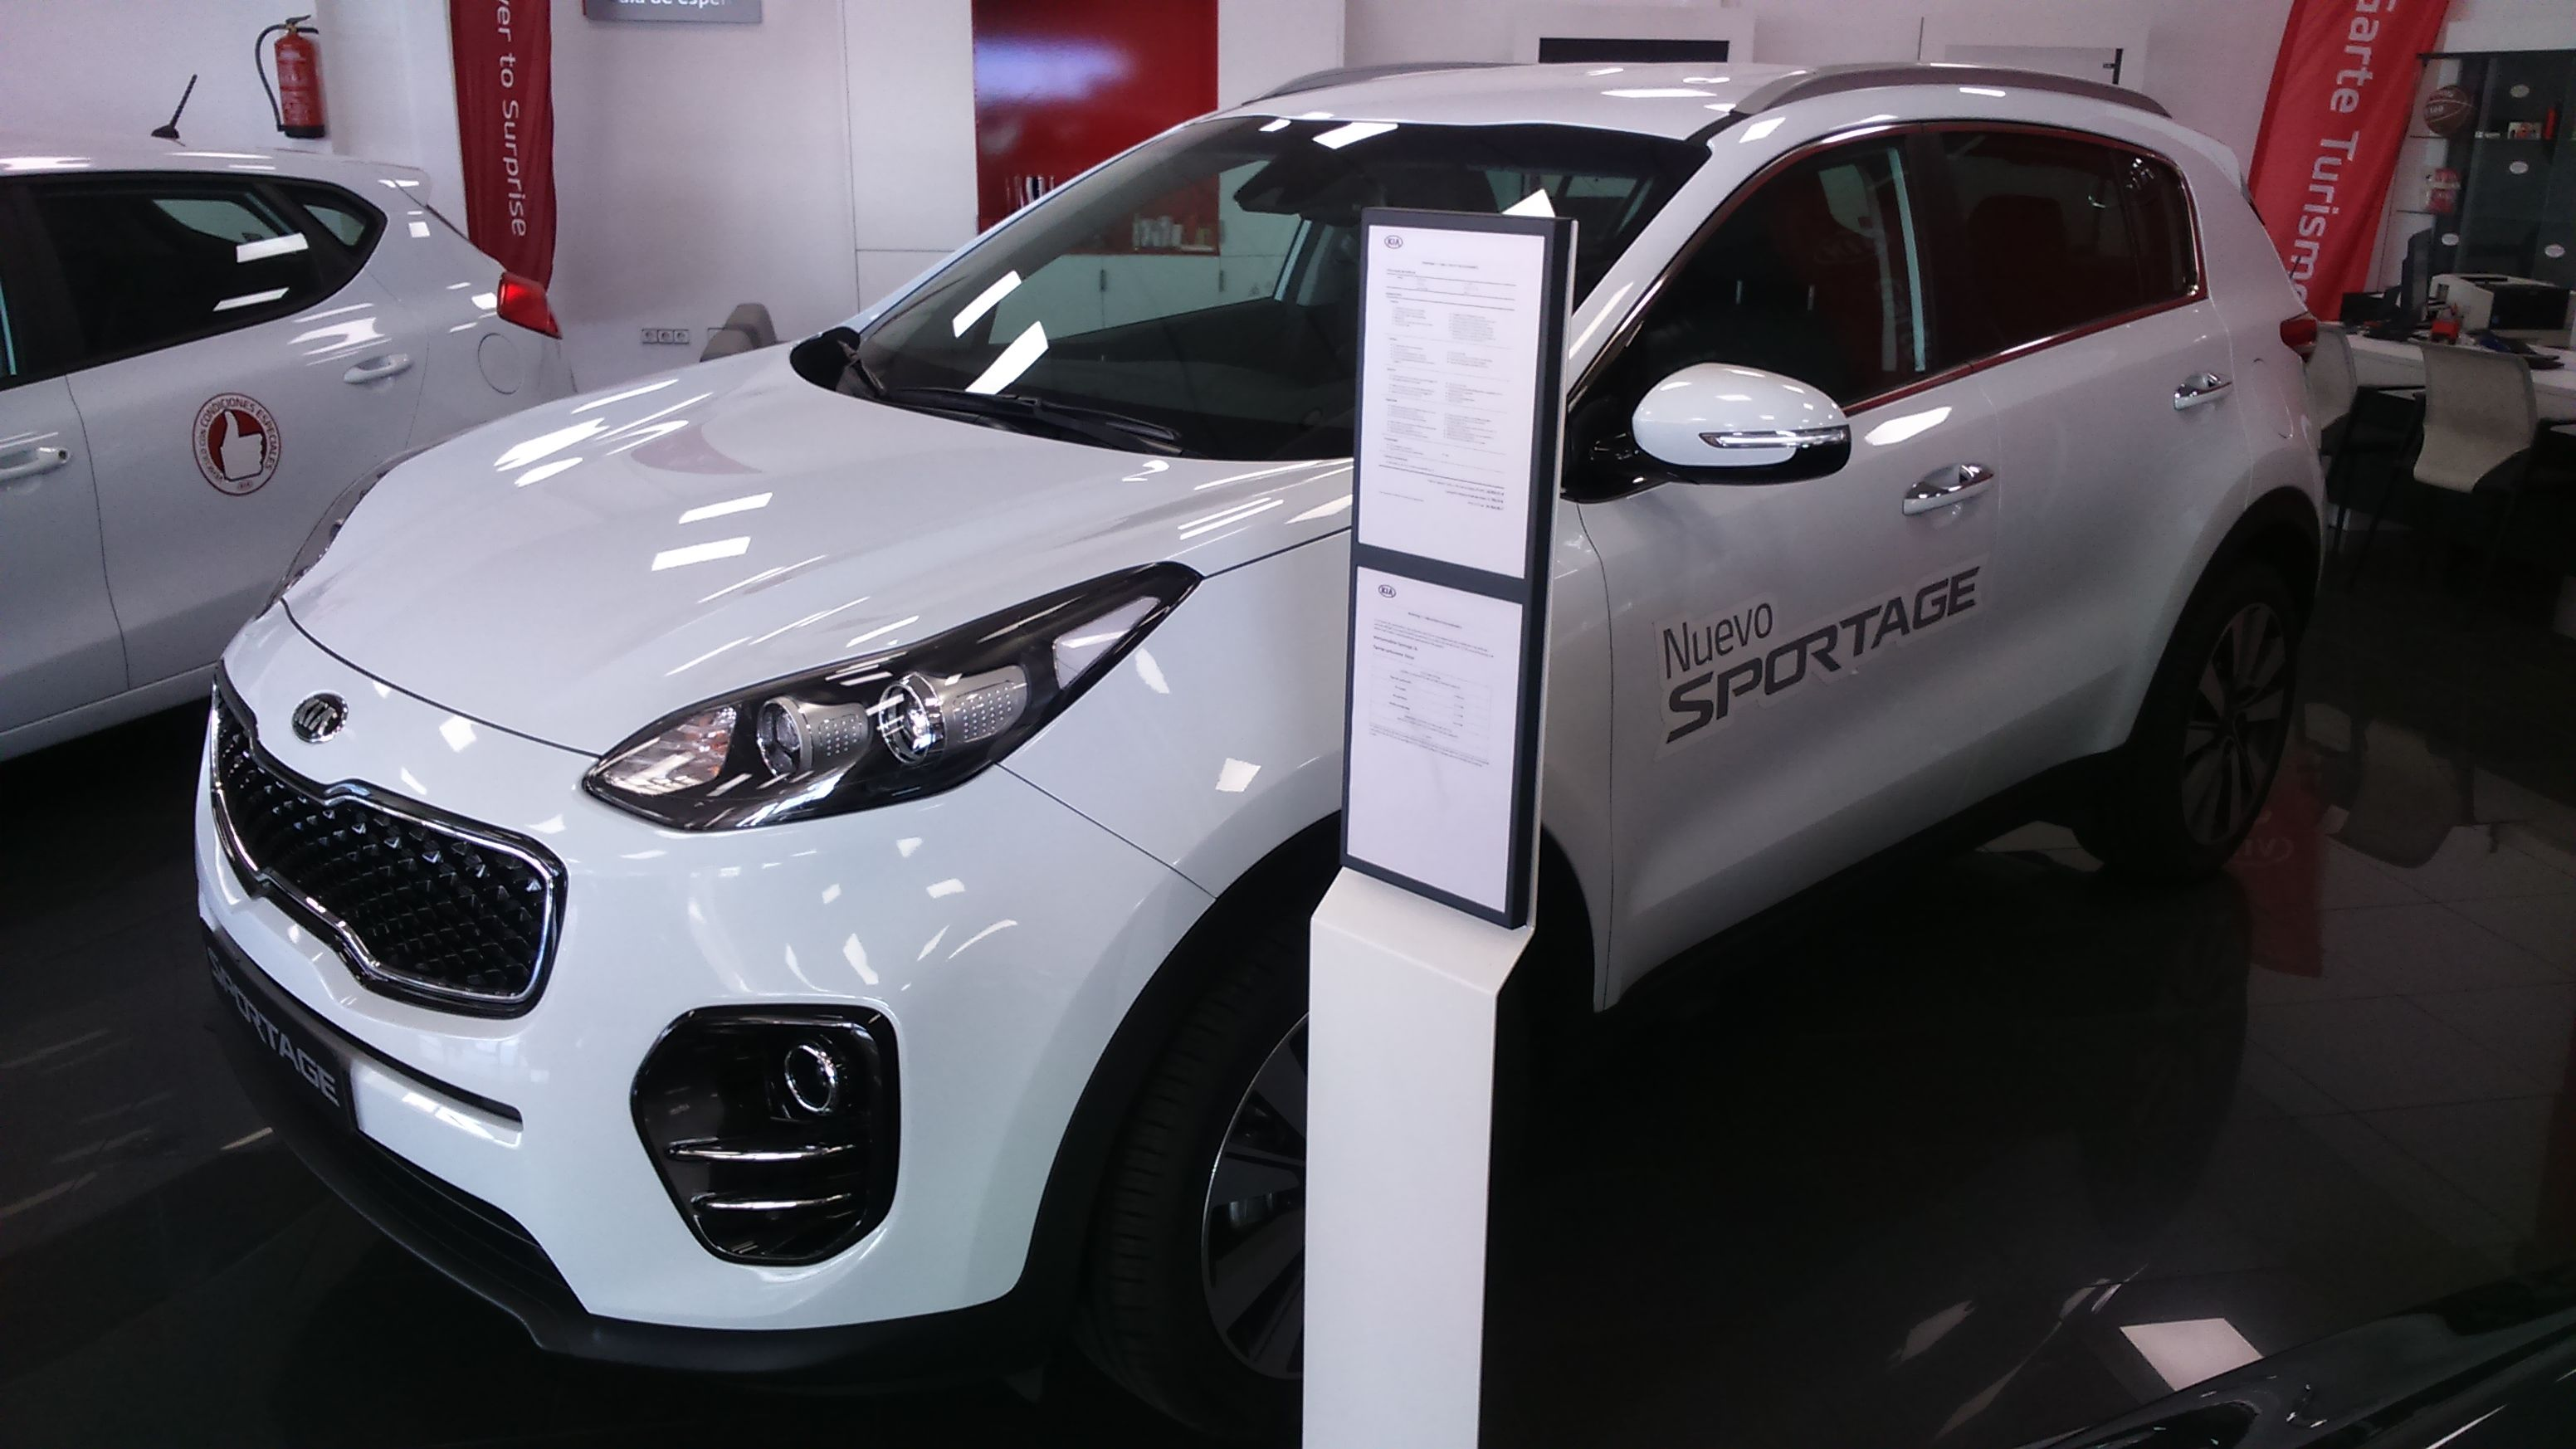 Kia Sportage 1.7 CRDi x-Tech17 Eco-Dynamics Diesel 115cv Color Blanco